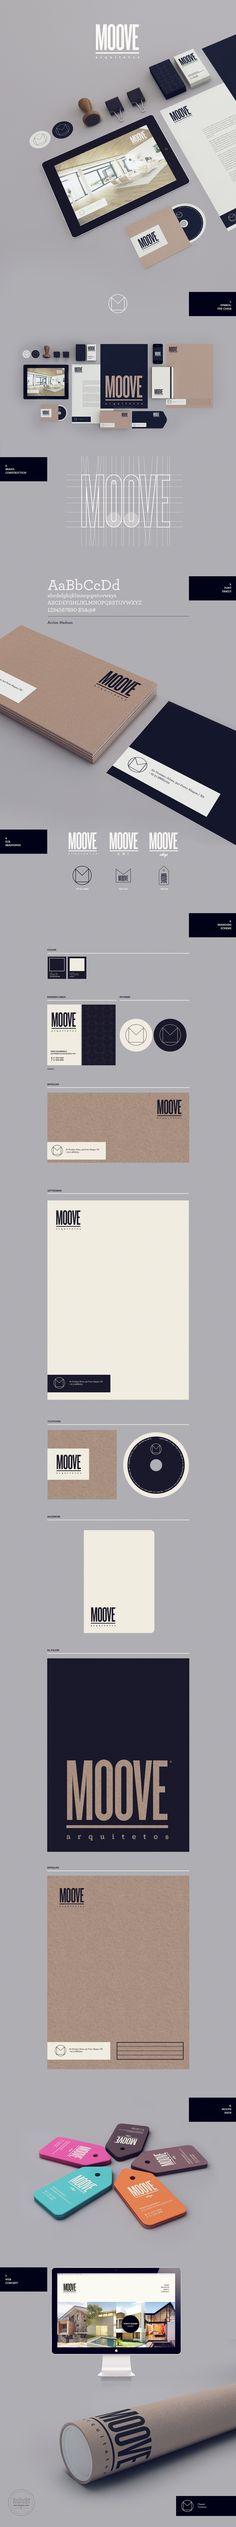 Identity / moove